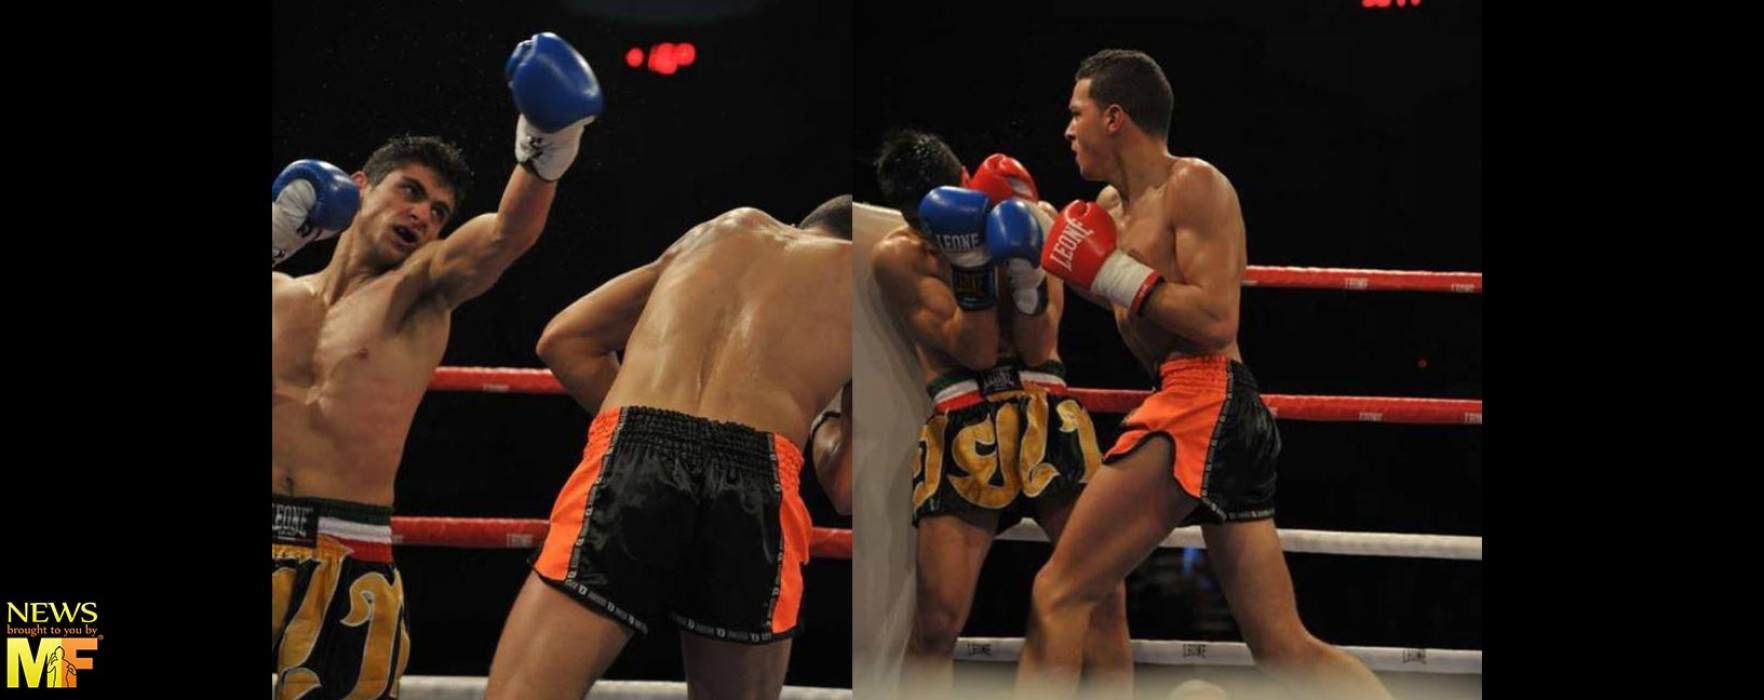 Video: Angelo Campoli vs Ilias Bulaid – The Night of Kick and Punch – 30/11/2013